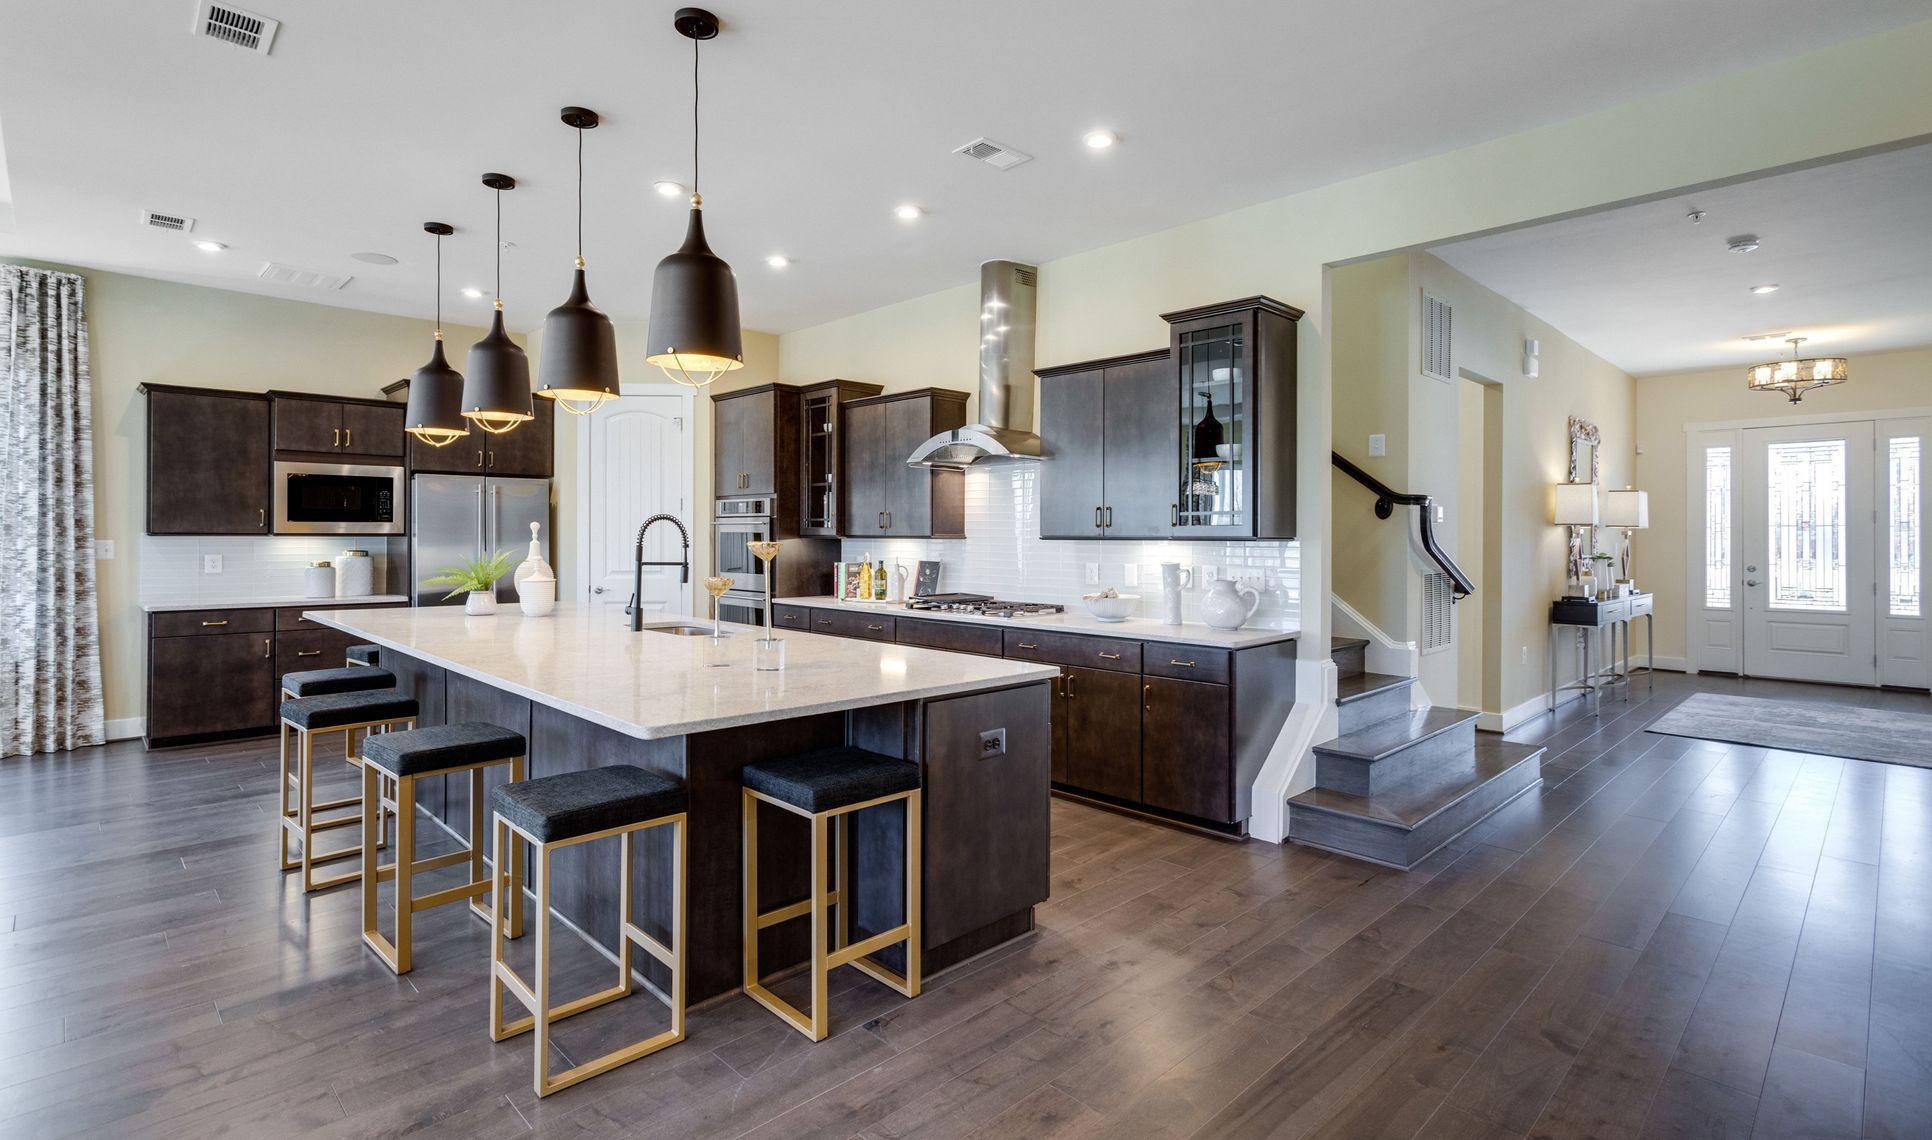 Interior:Kitchen with breakfast bar seating